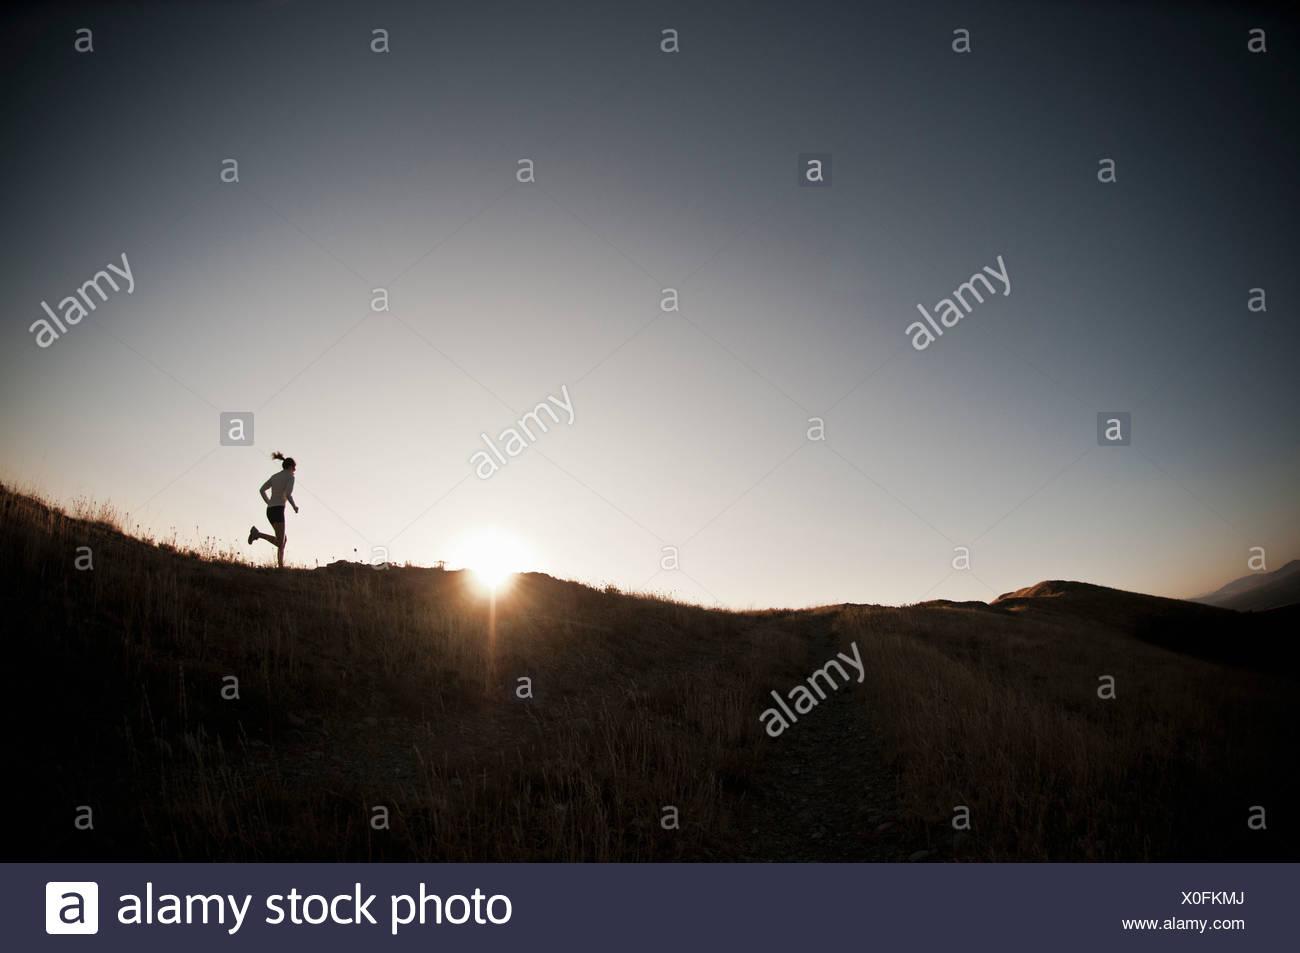 Woman running on dirt path - Stock Image